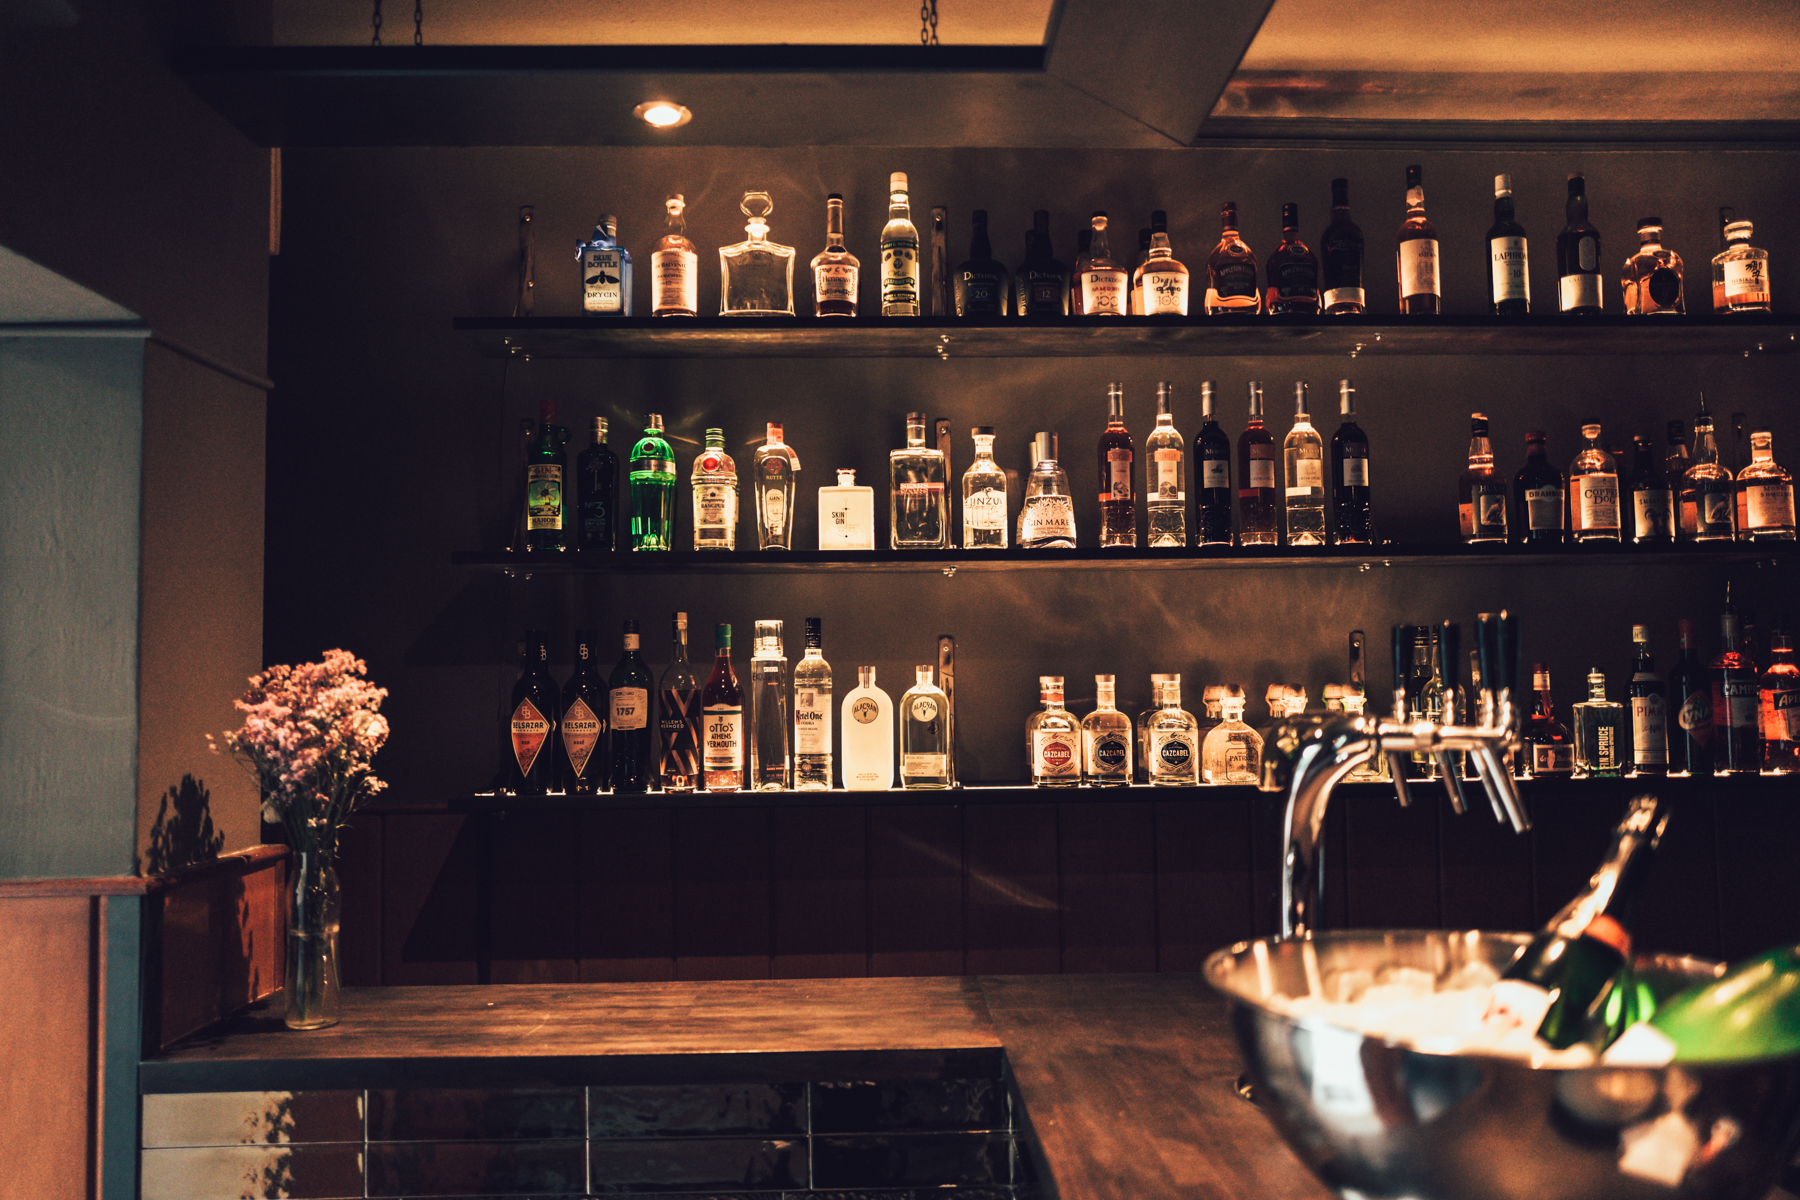 Geheimtipp Hamburg Altona Bar Tiny Oyster Inn Cristina Lopez 6